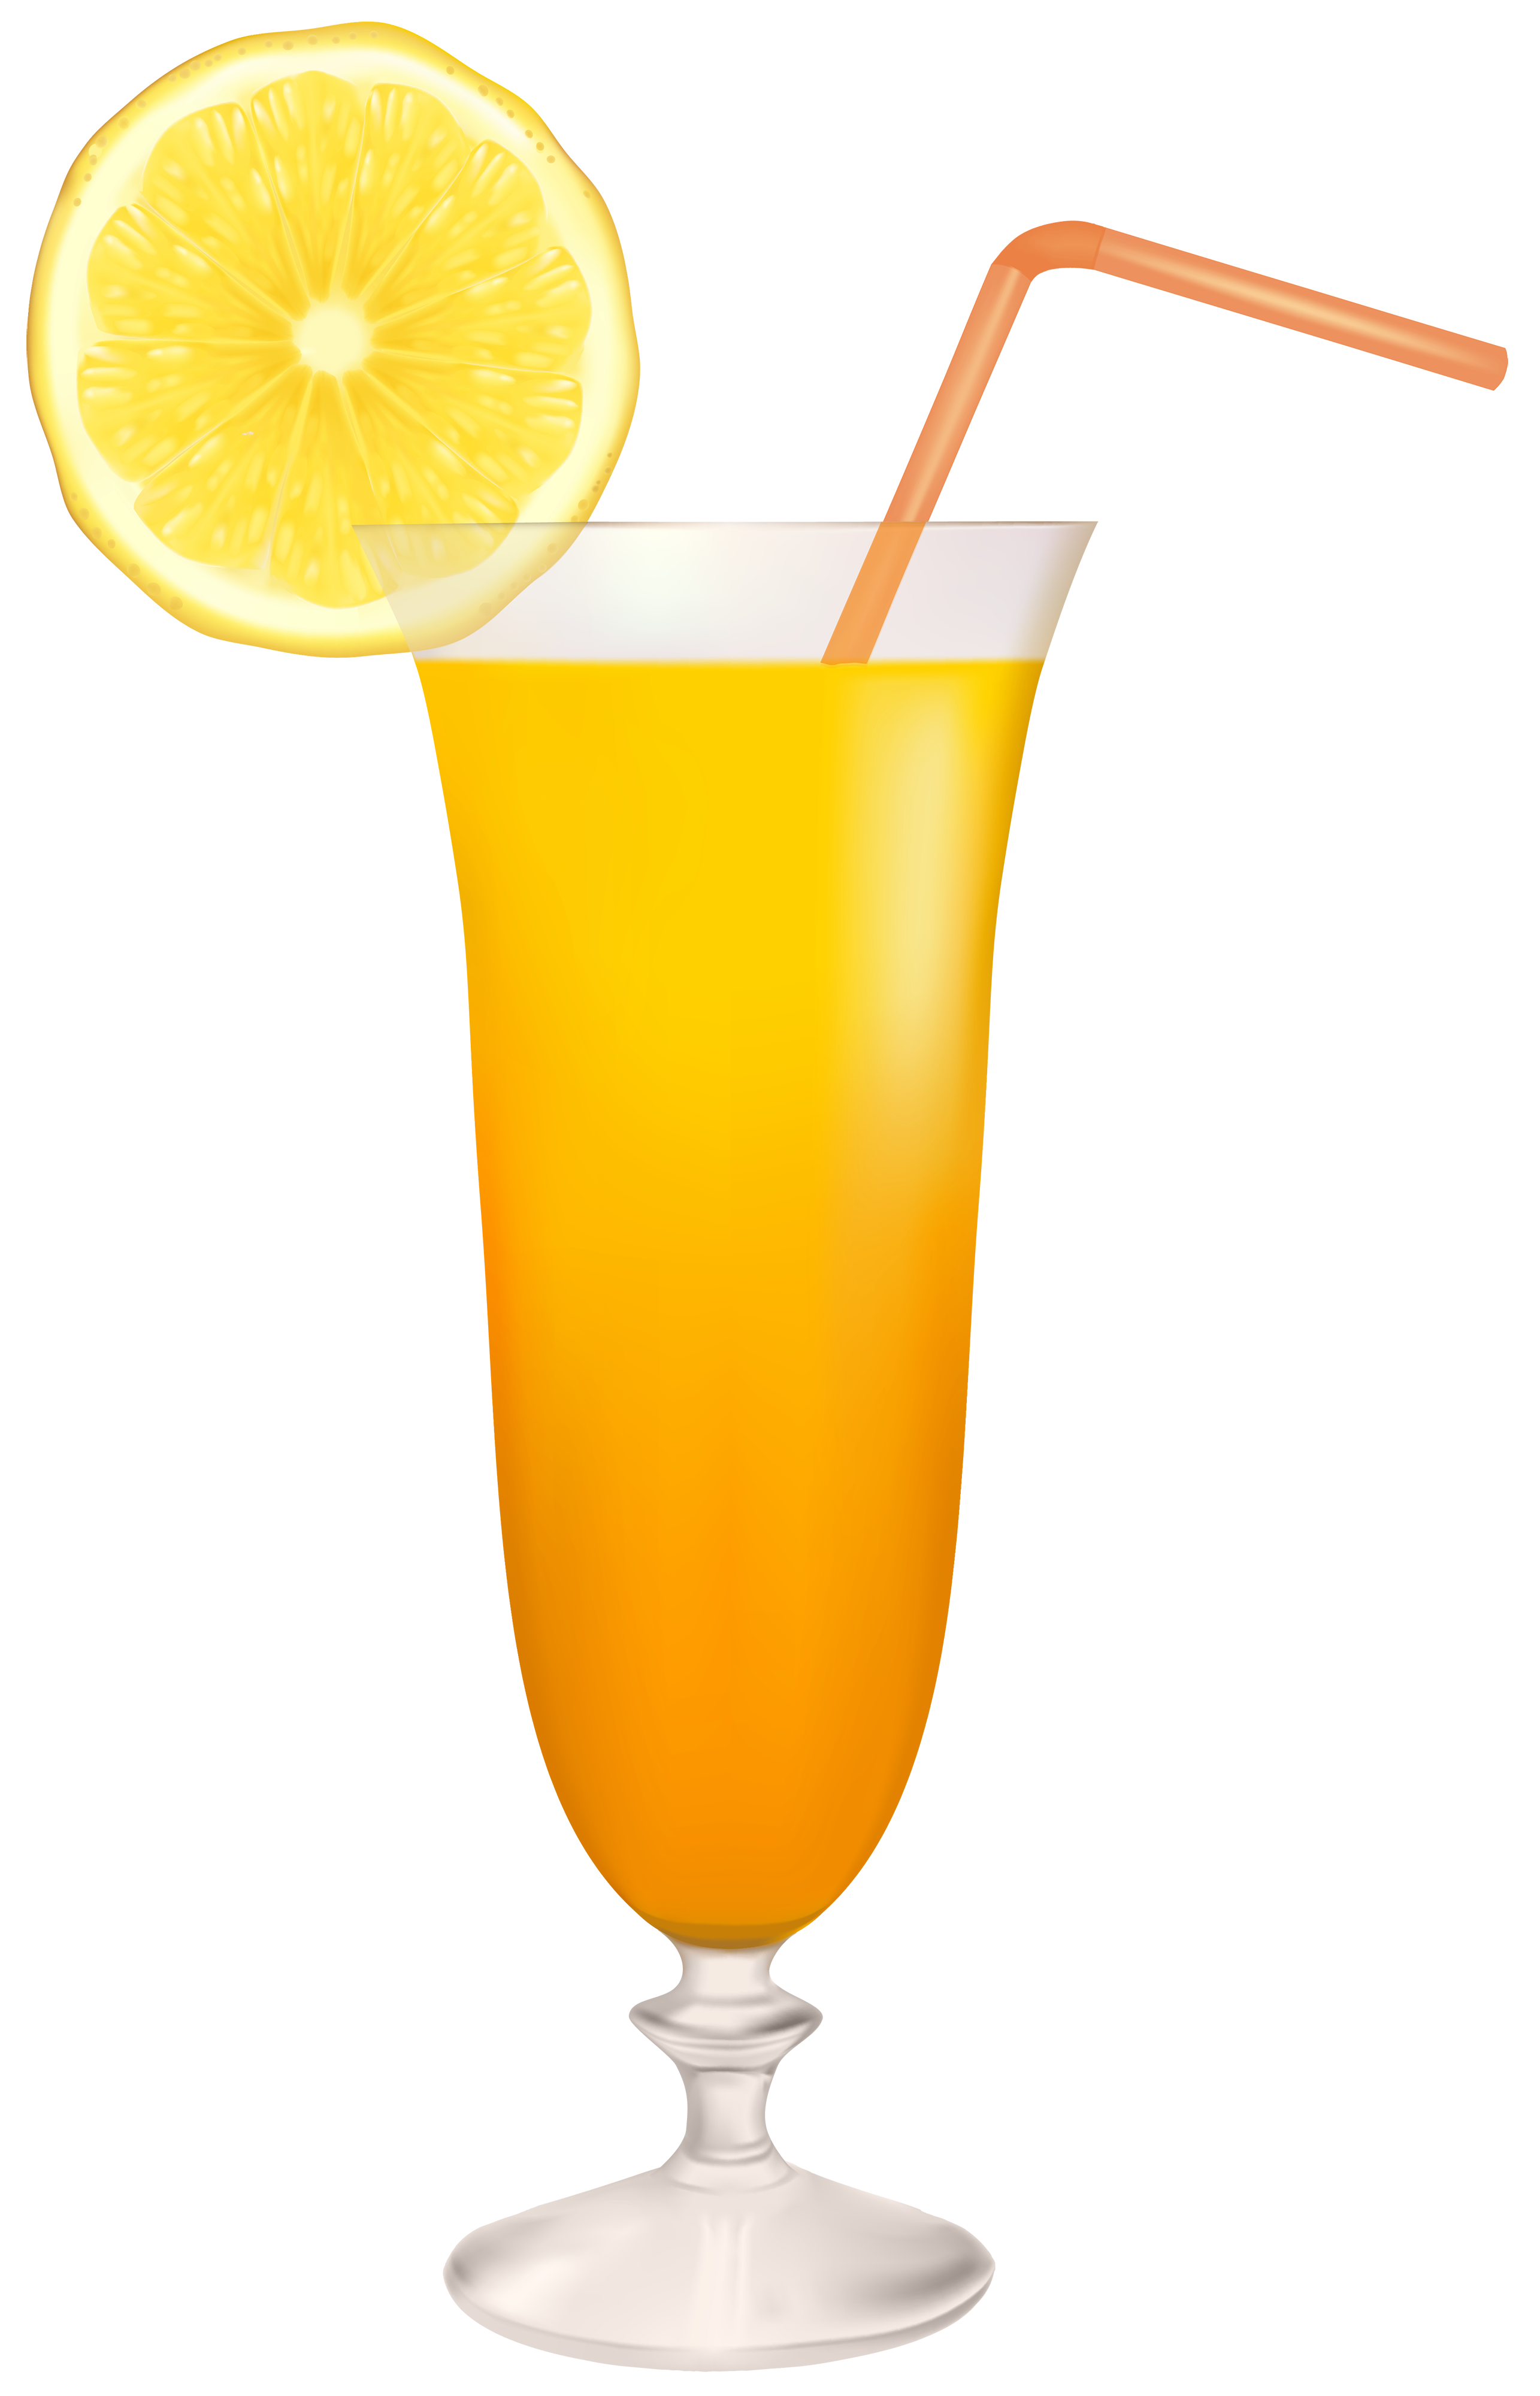 Glass lemon frames illustrations. Cocktail clipart juice